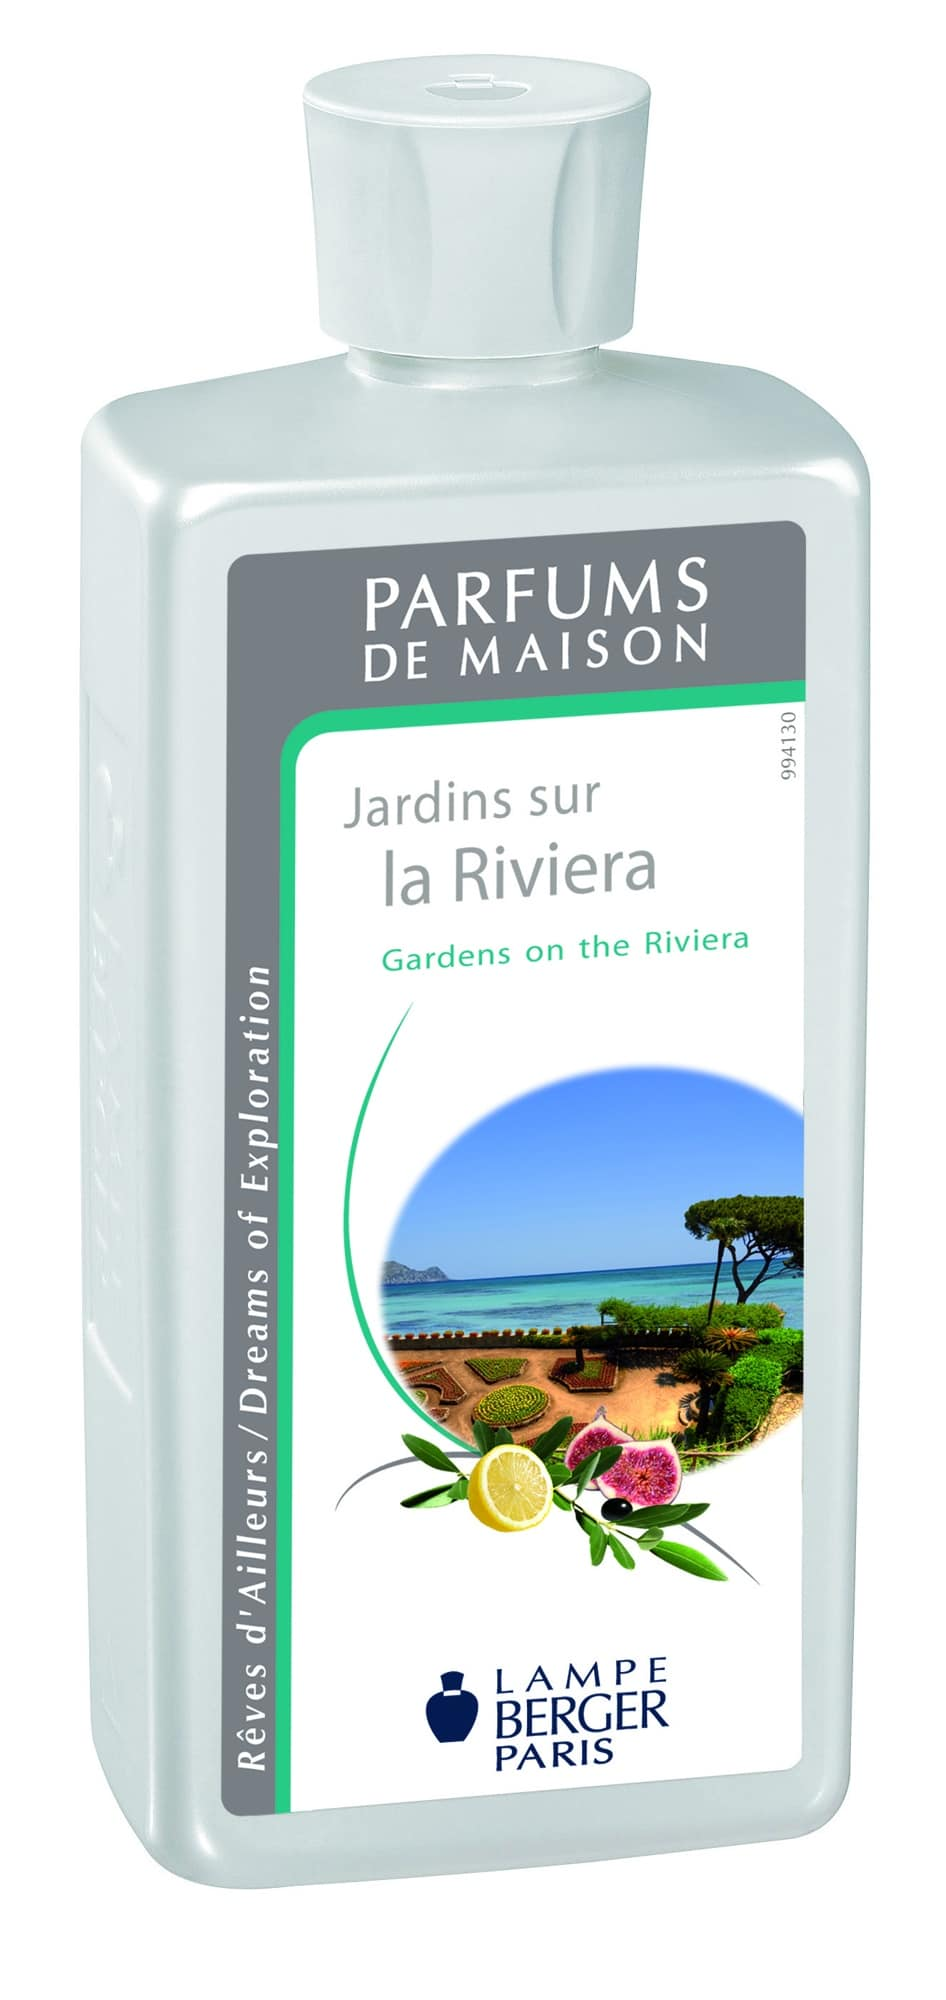 parfum maison lampe berger jardin sur la riviera 16 00. Black Bedroom Furniture Sets. Home Design Ideas